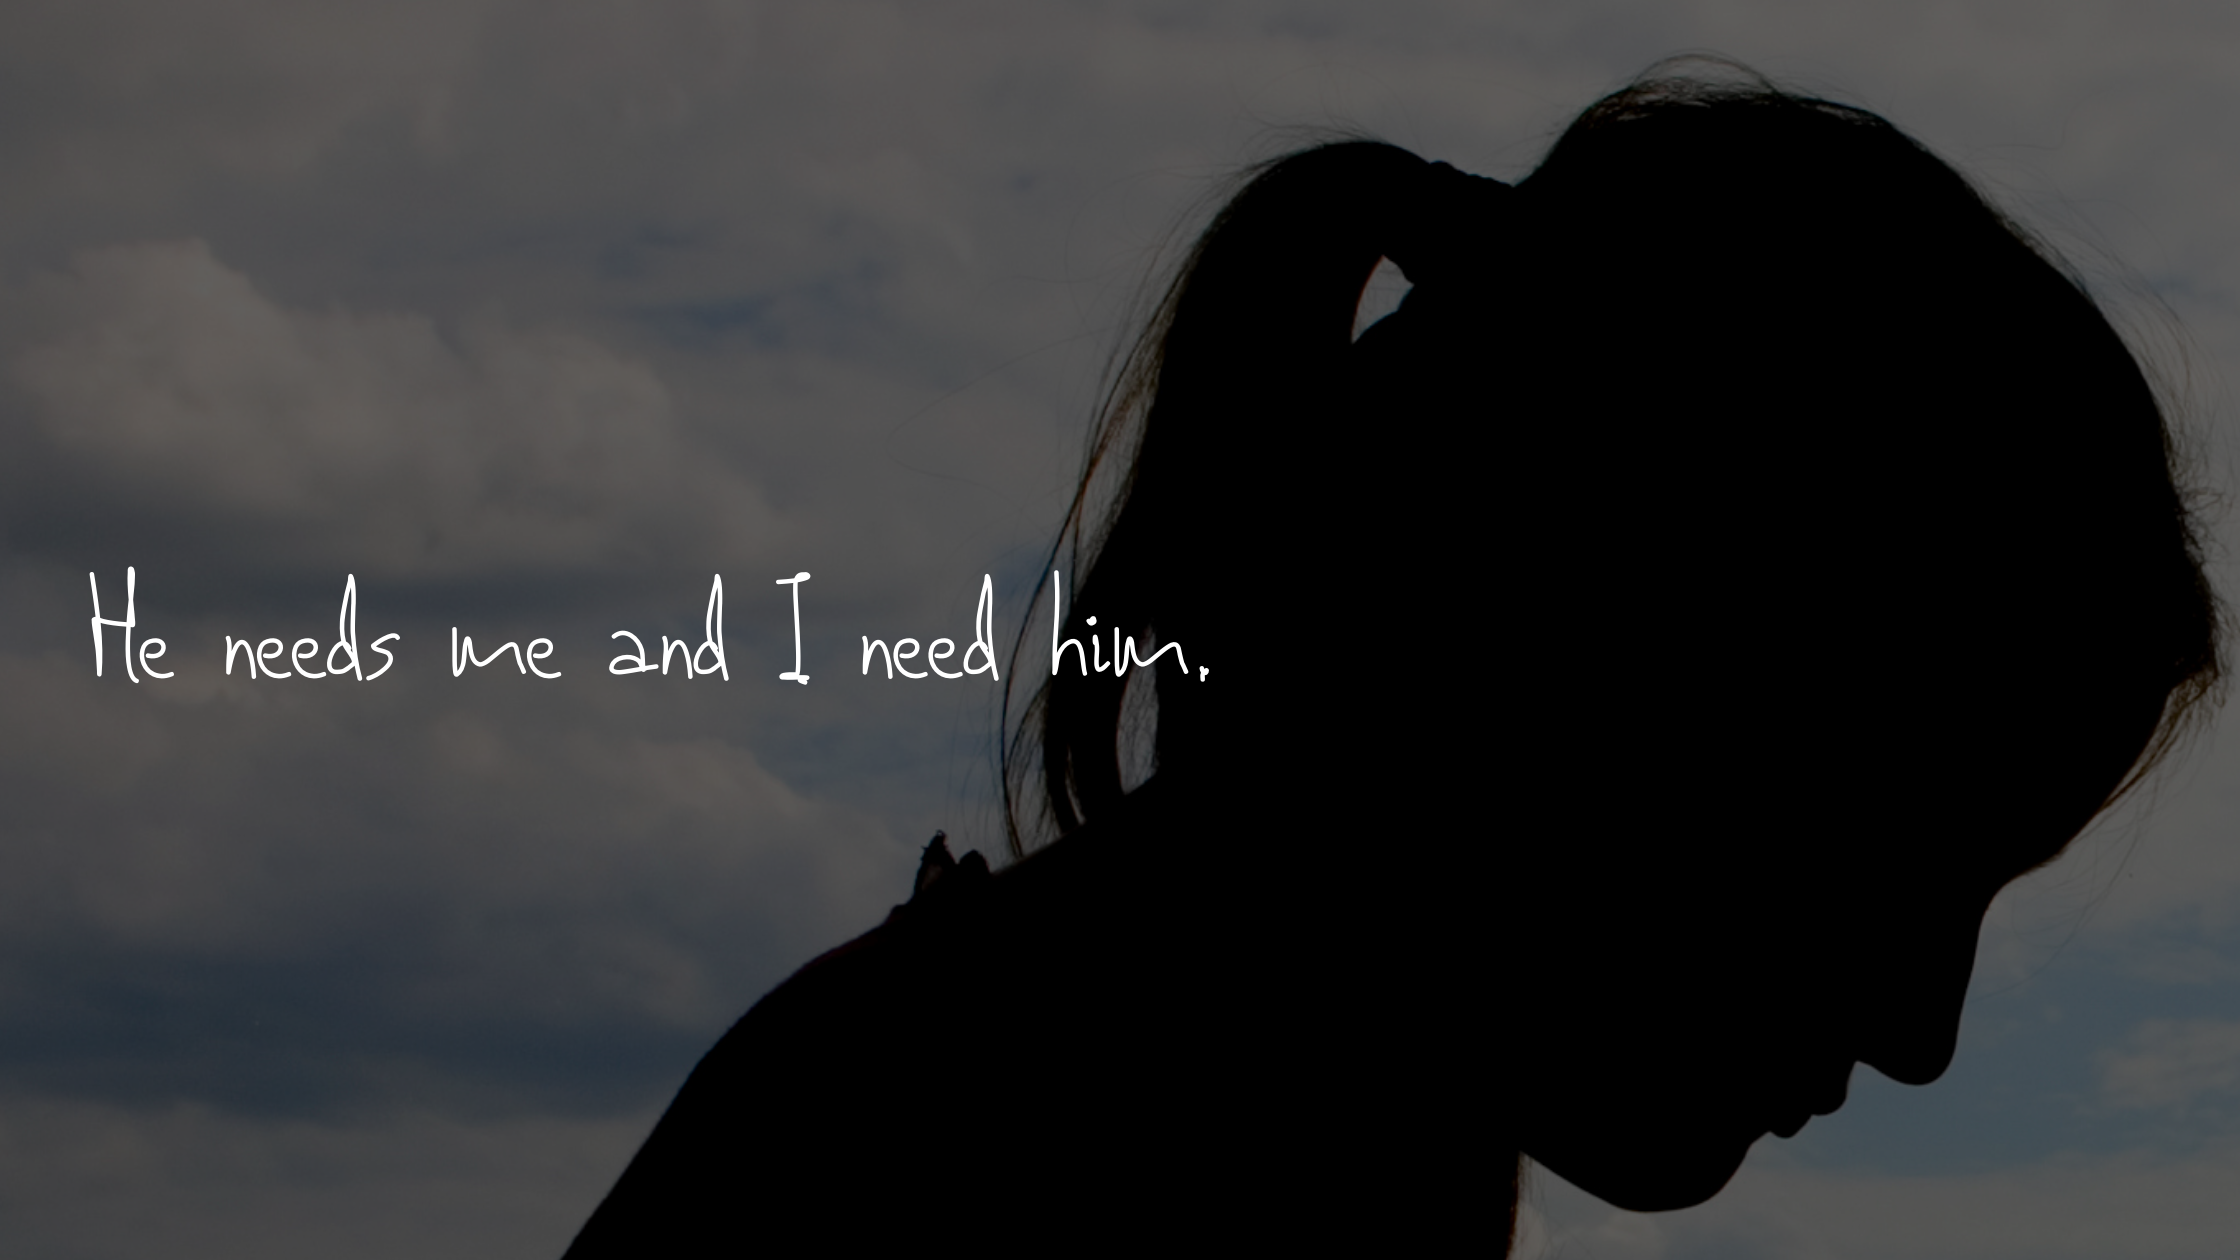 He needs me